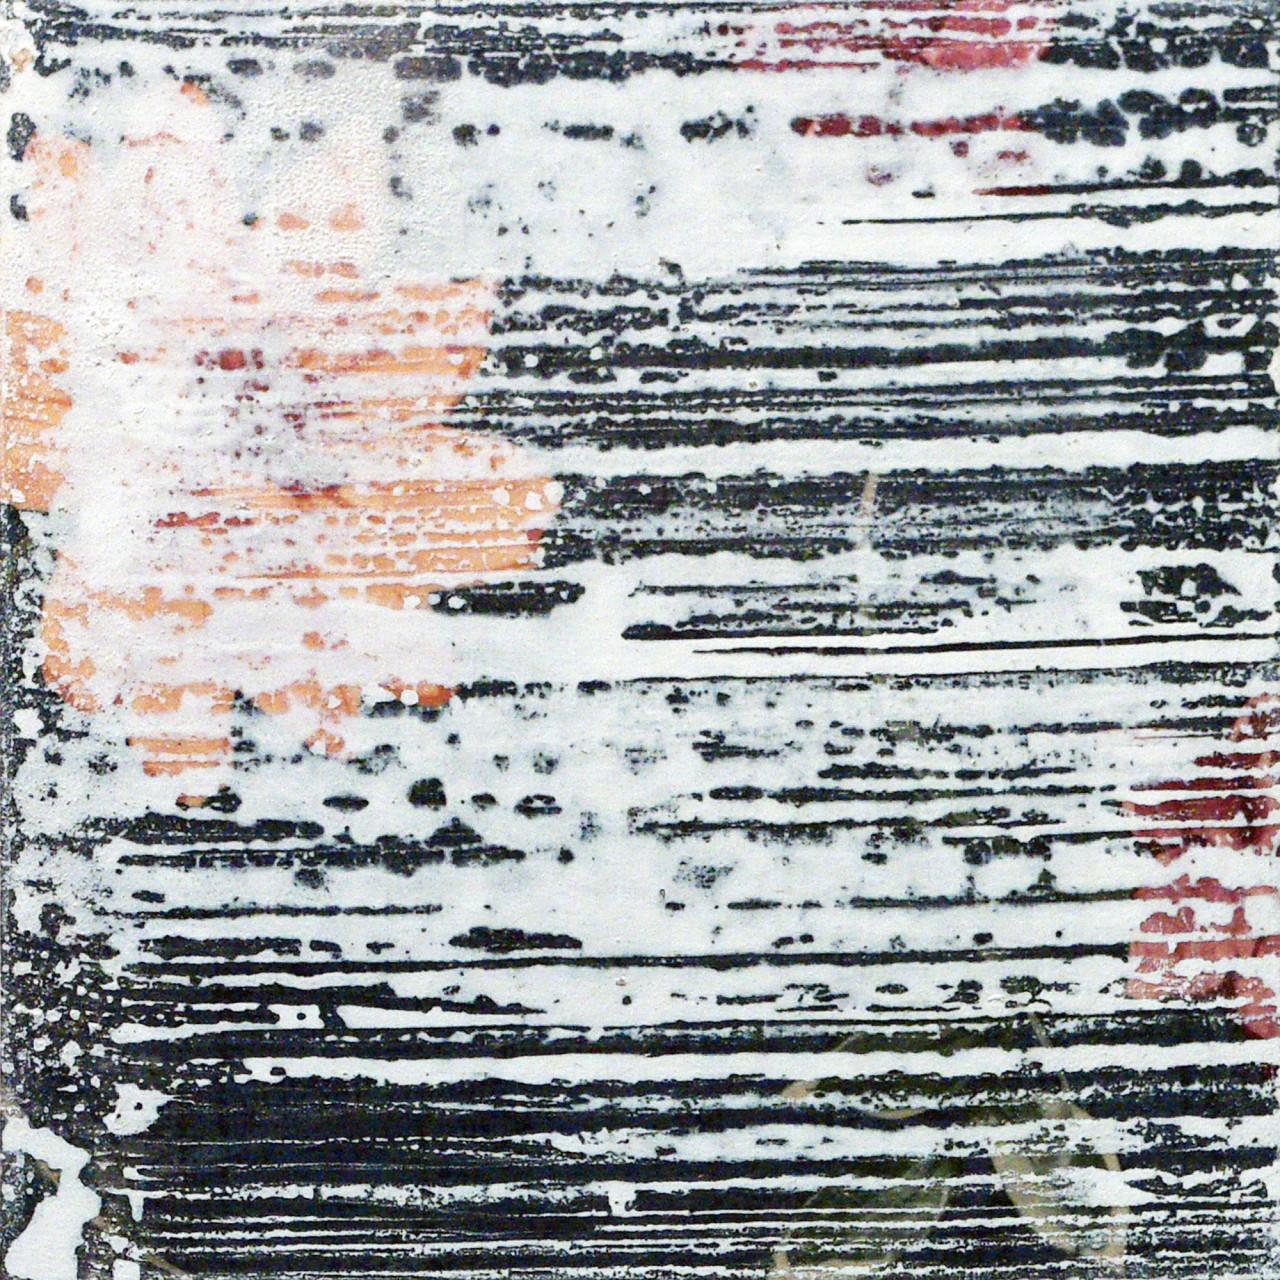 623.2, 2015 tecnica mista su tavola 23x23 cm